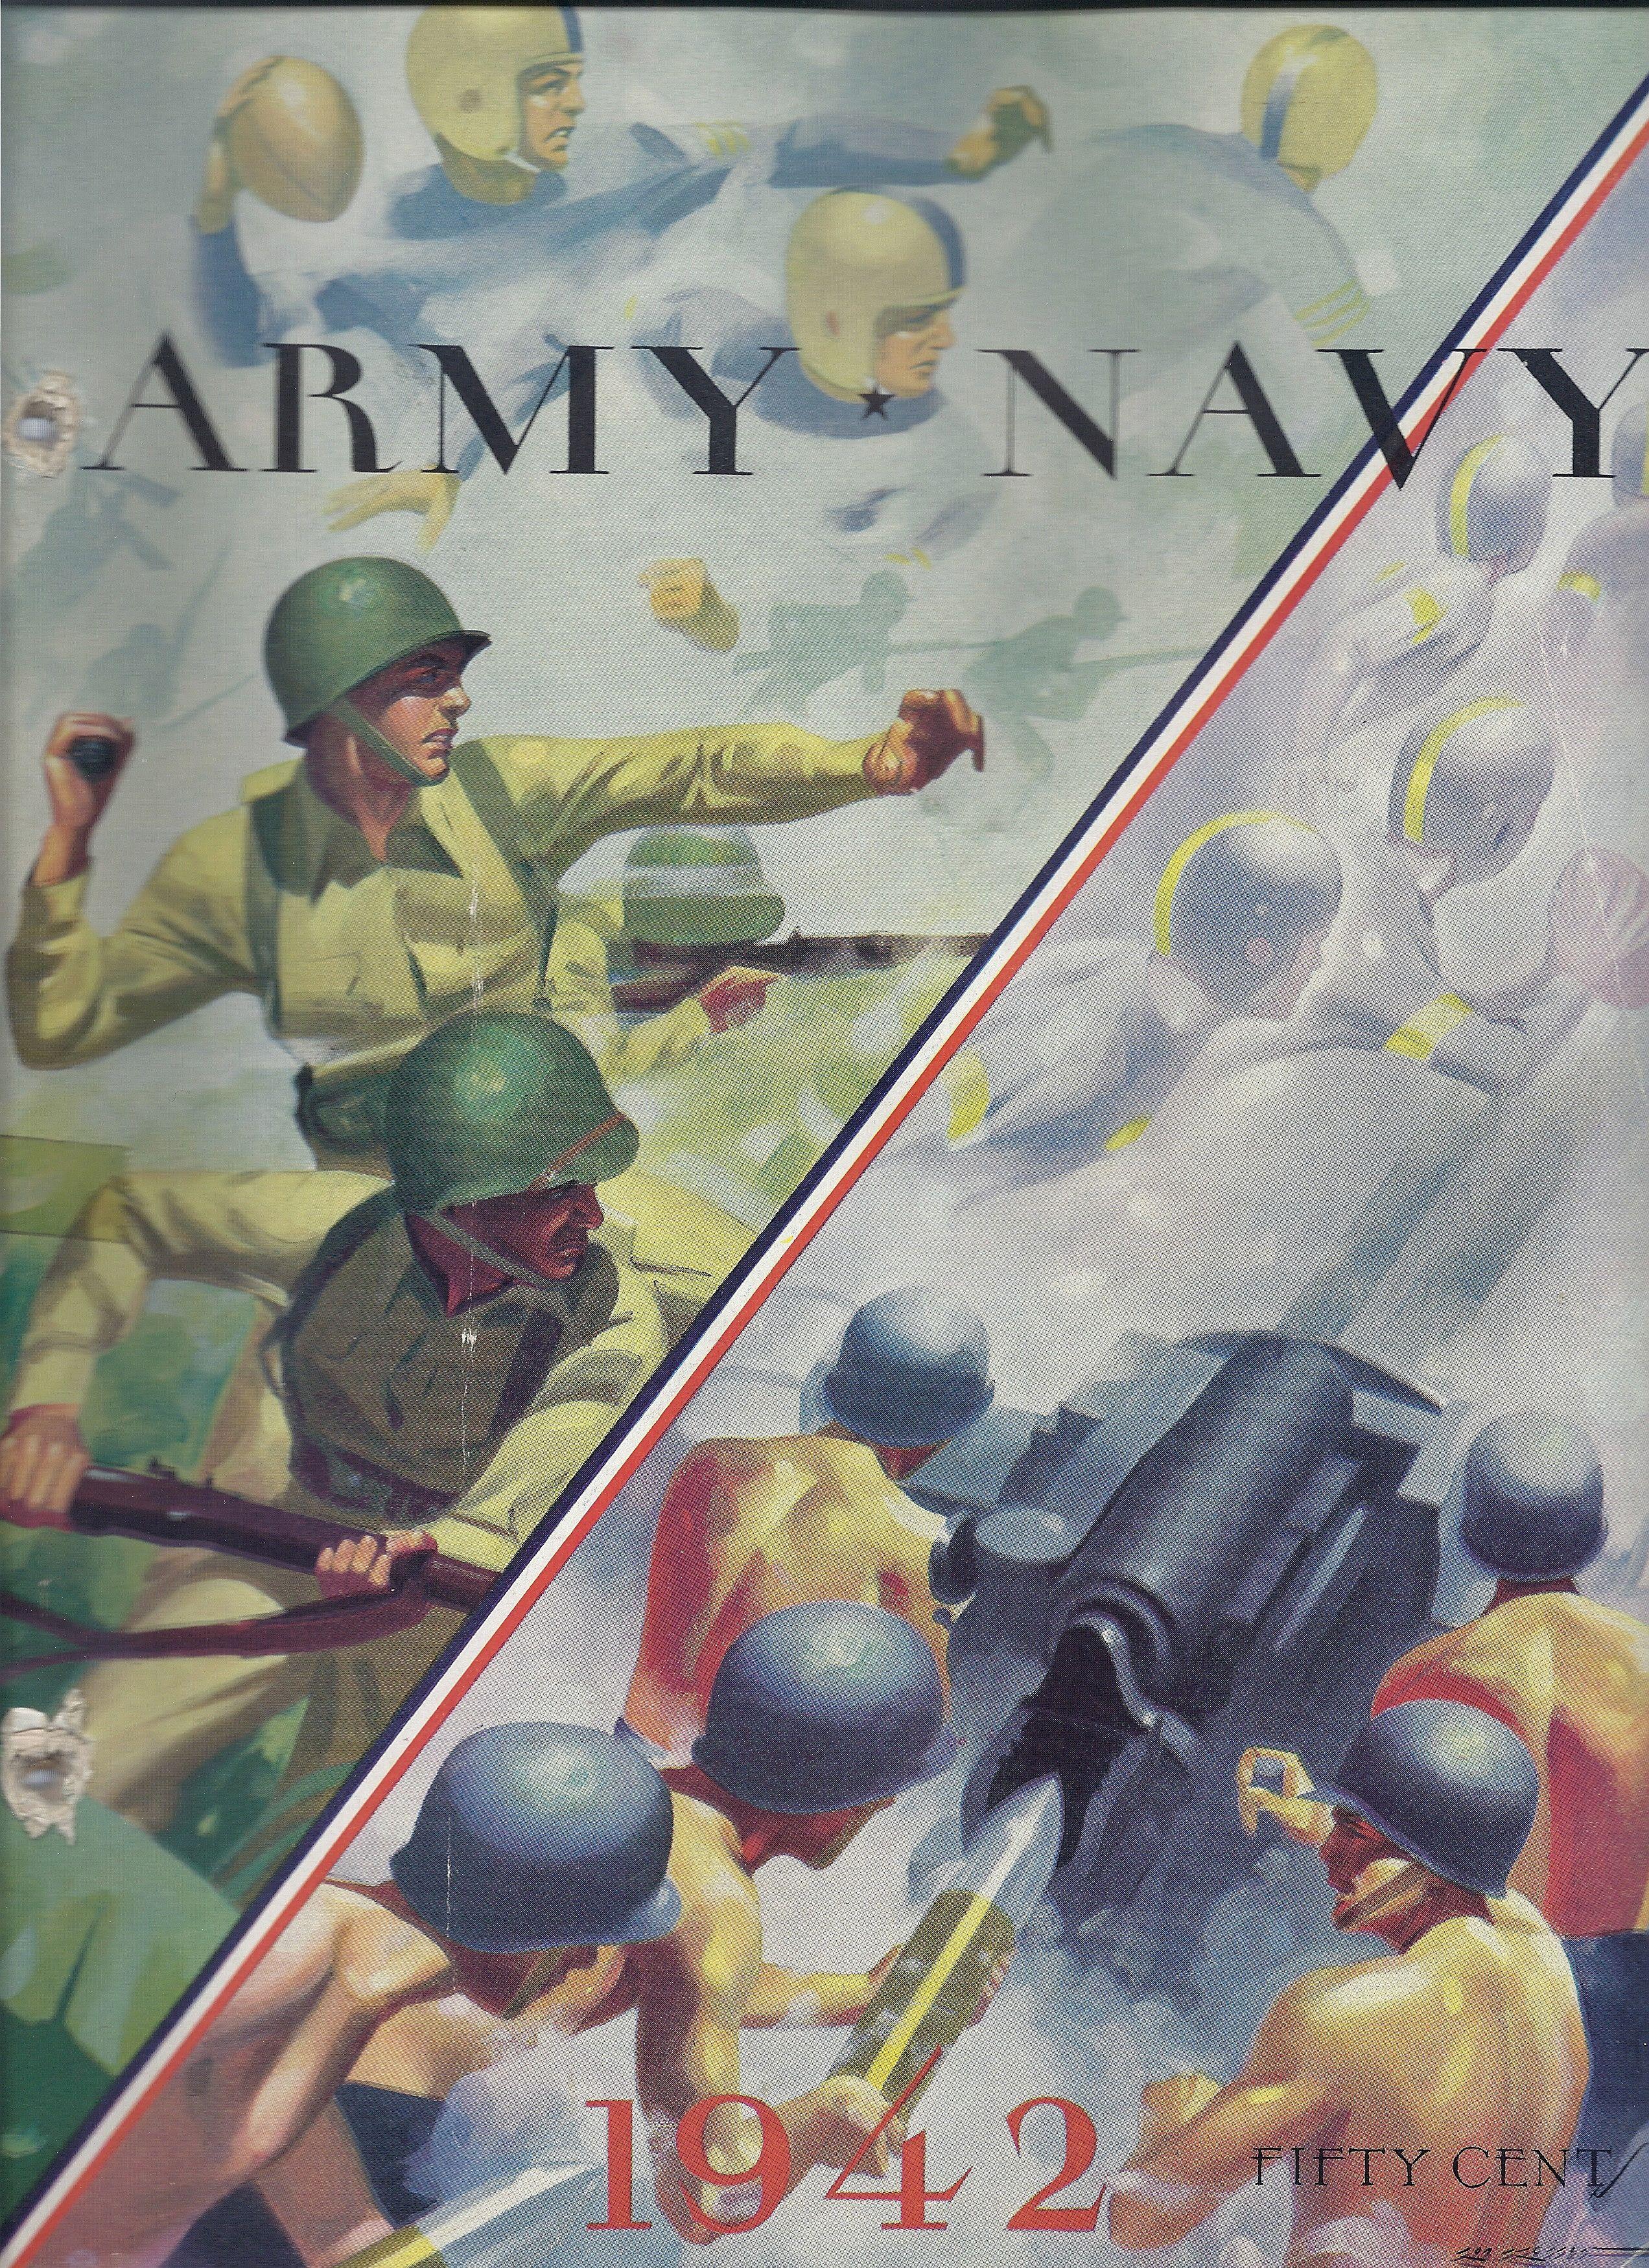 1942 army navy football program annapolis thompson field